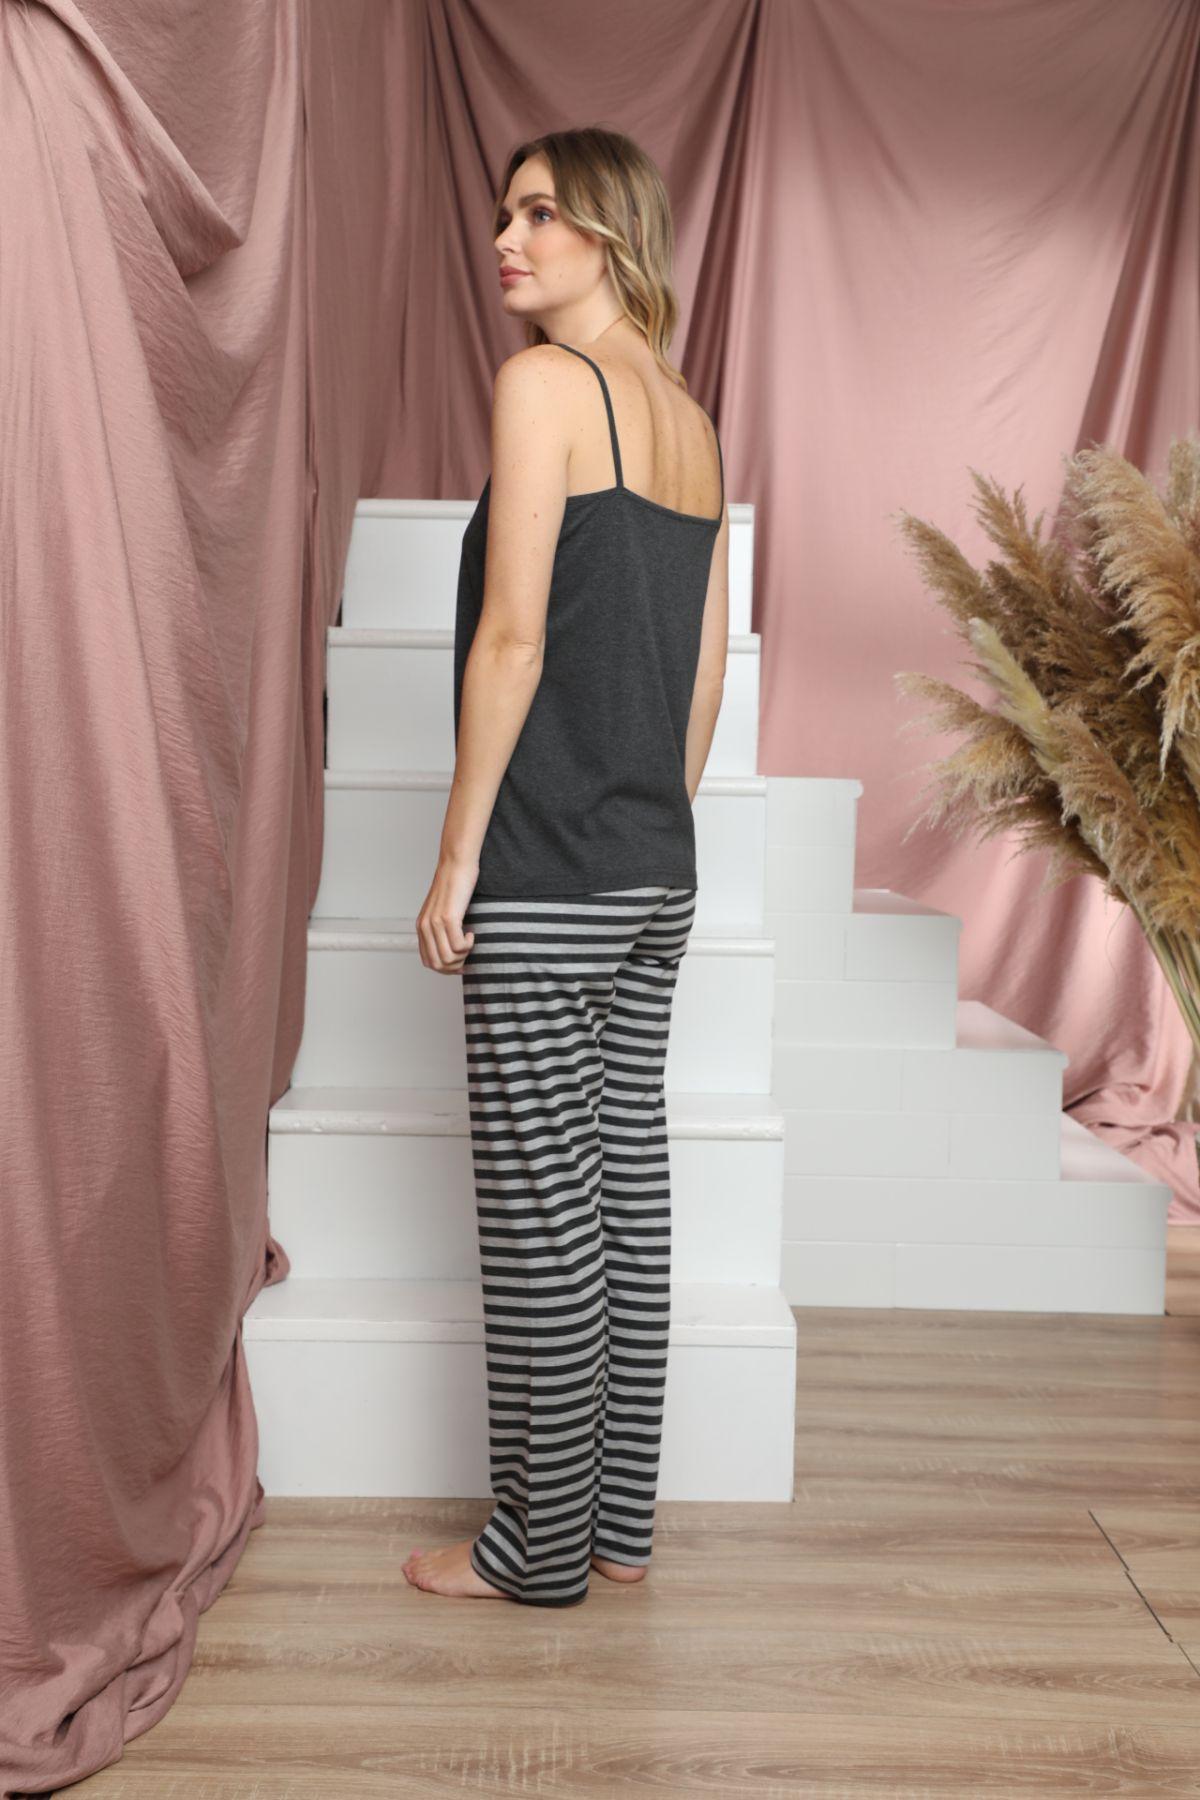 SİYAH İNCİ - İp Askılı Dantelli Pamuklu Likralı Pijama Takım 21133910